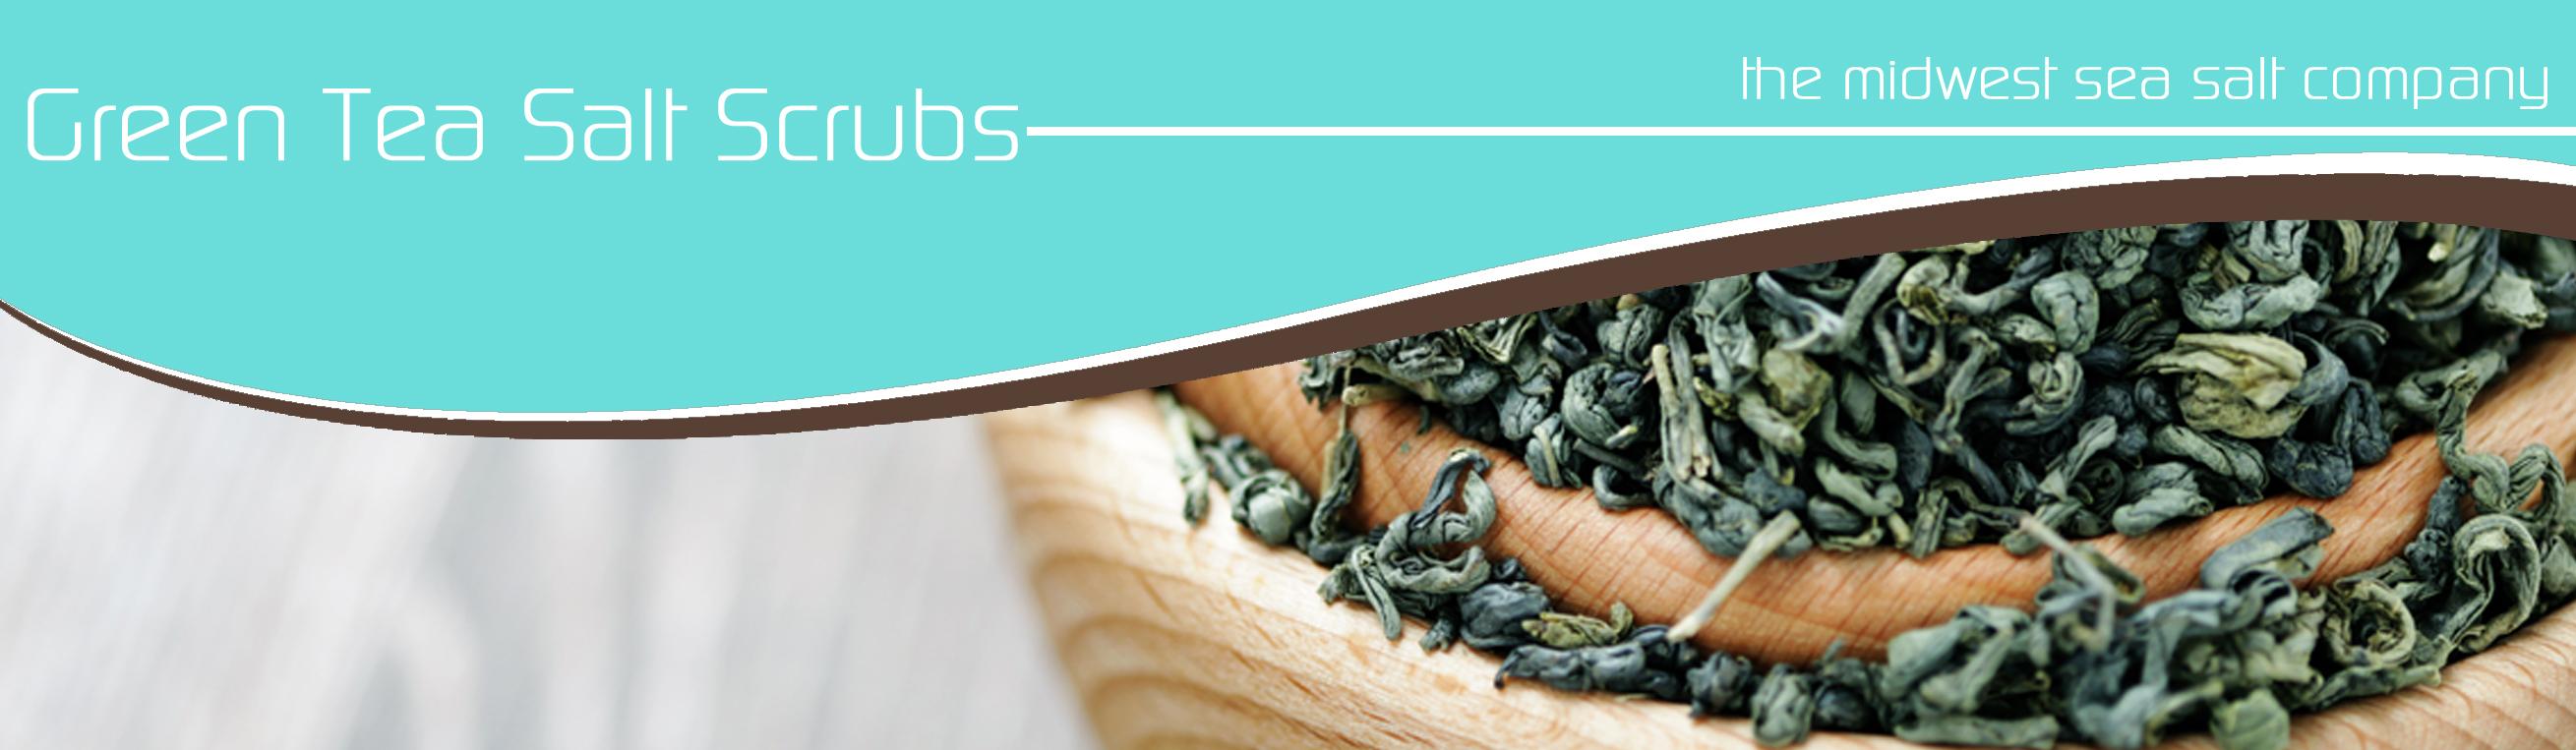 green-tea-scrubs-midwest-sea-salt.jpg